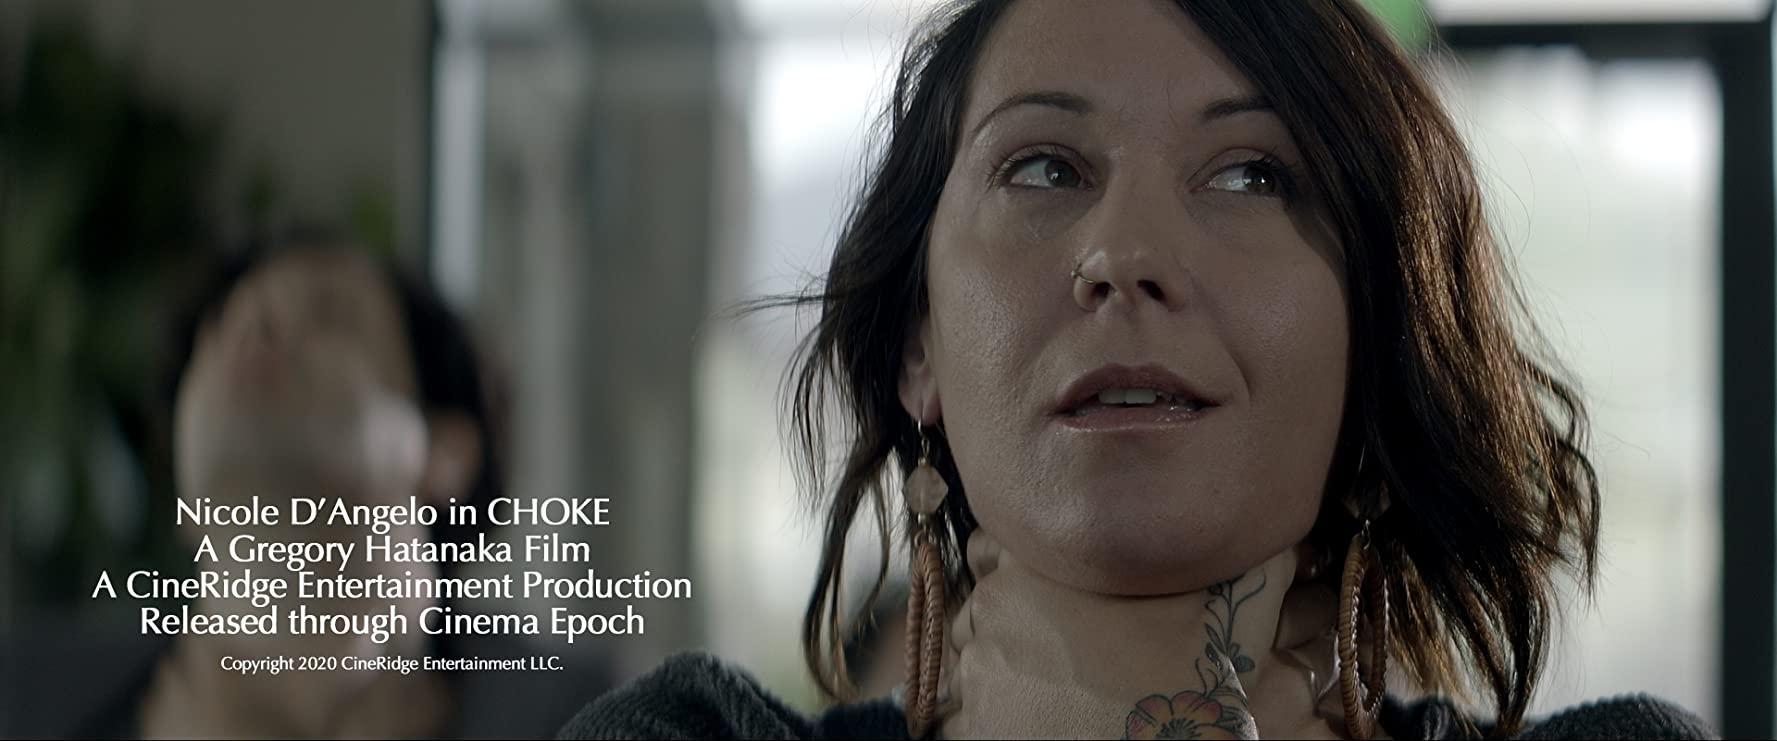 مشاهدة فيلم Choke (2020) مترجم HD اون لاين